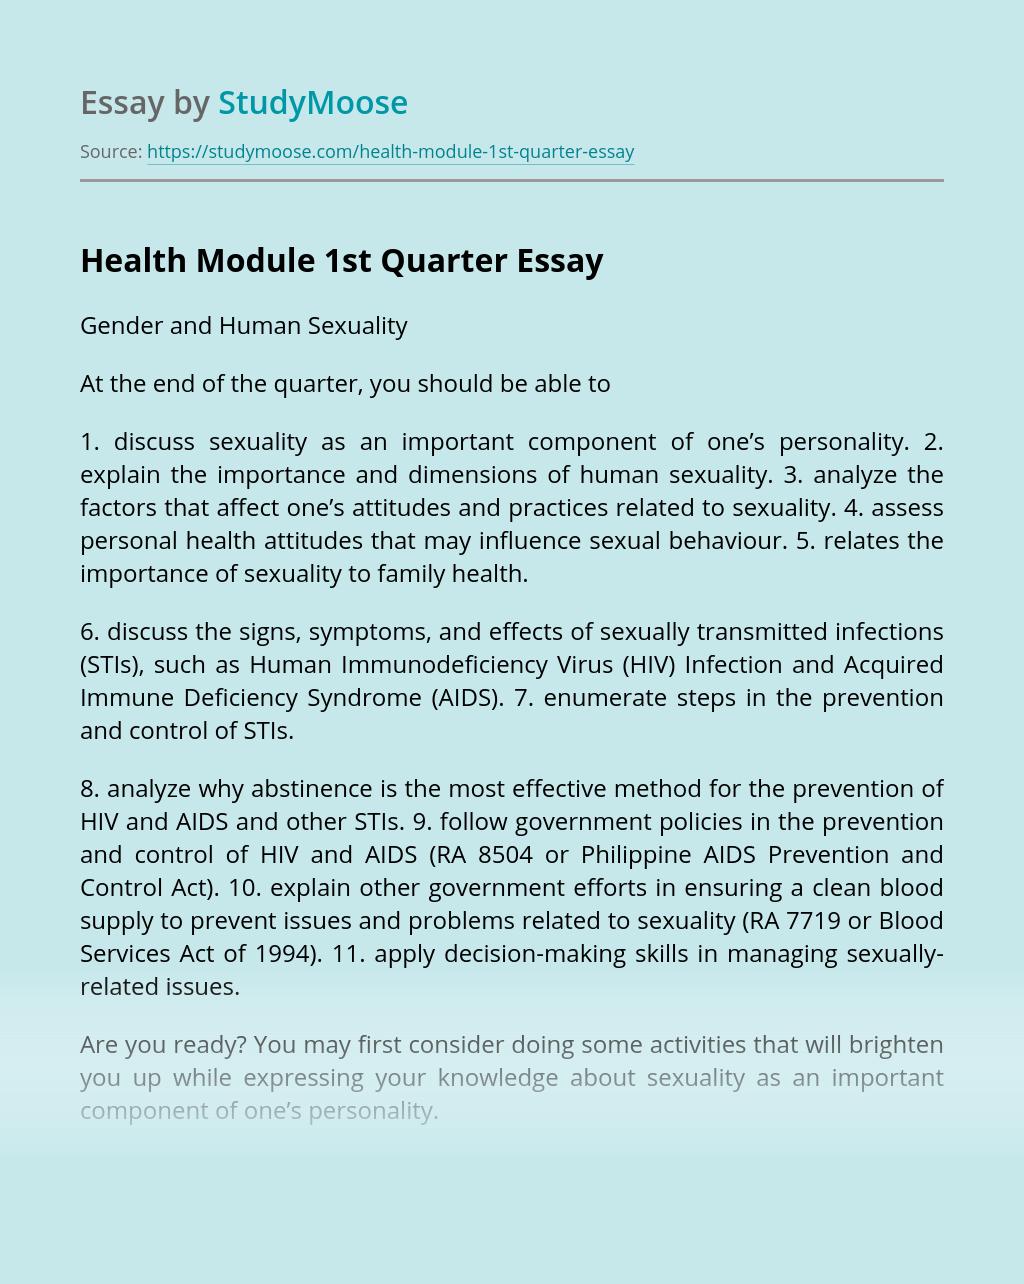 Health Module 1st Quarter